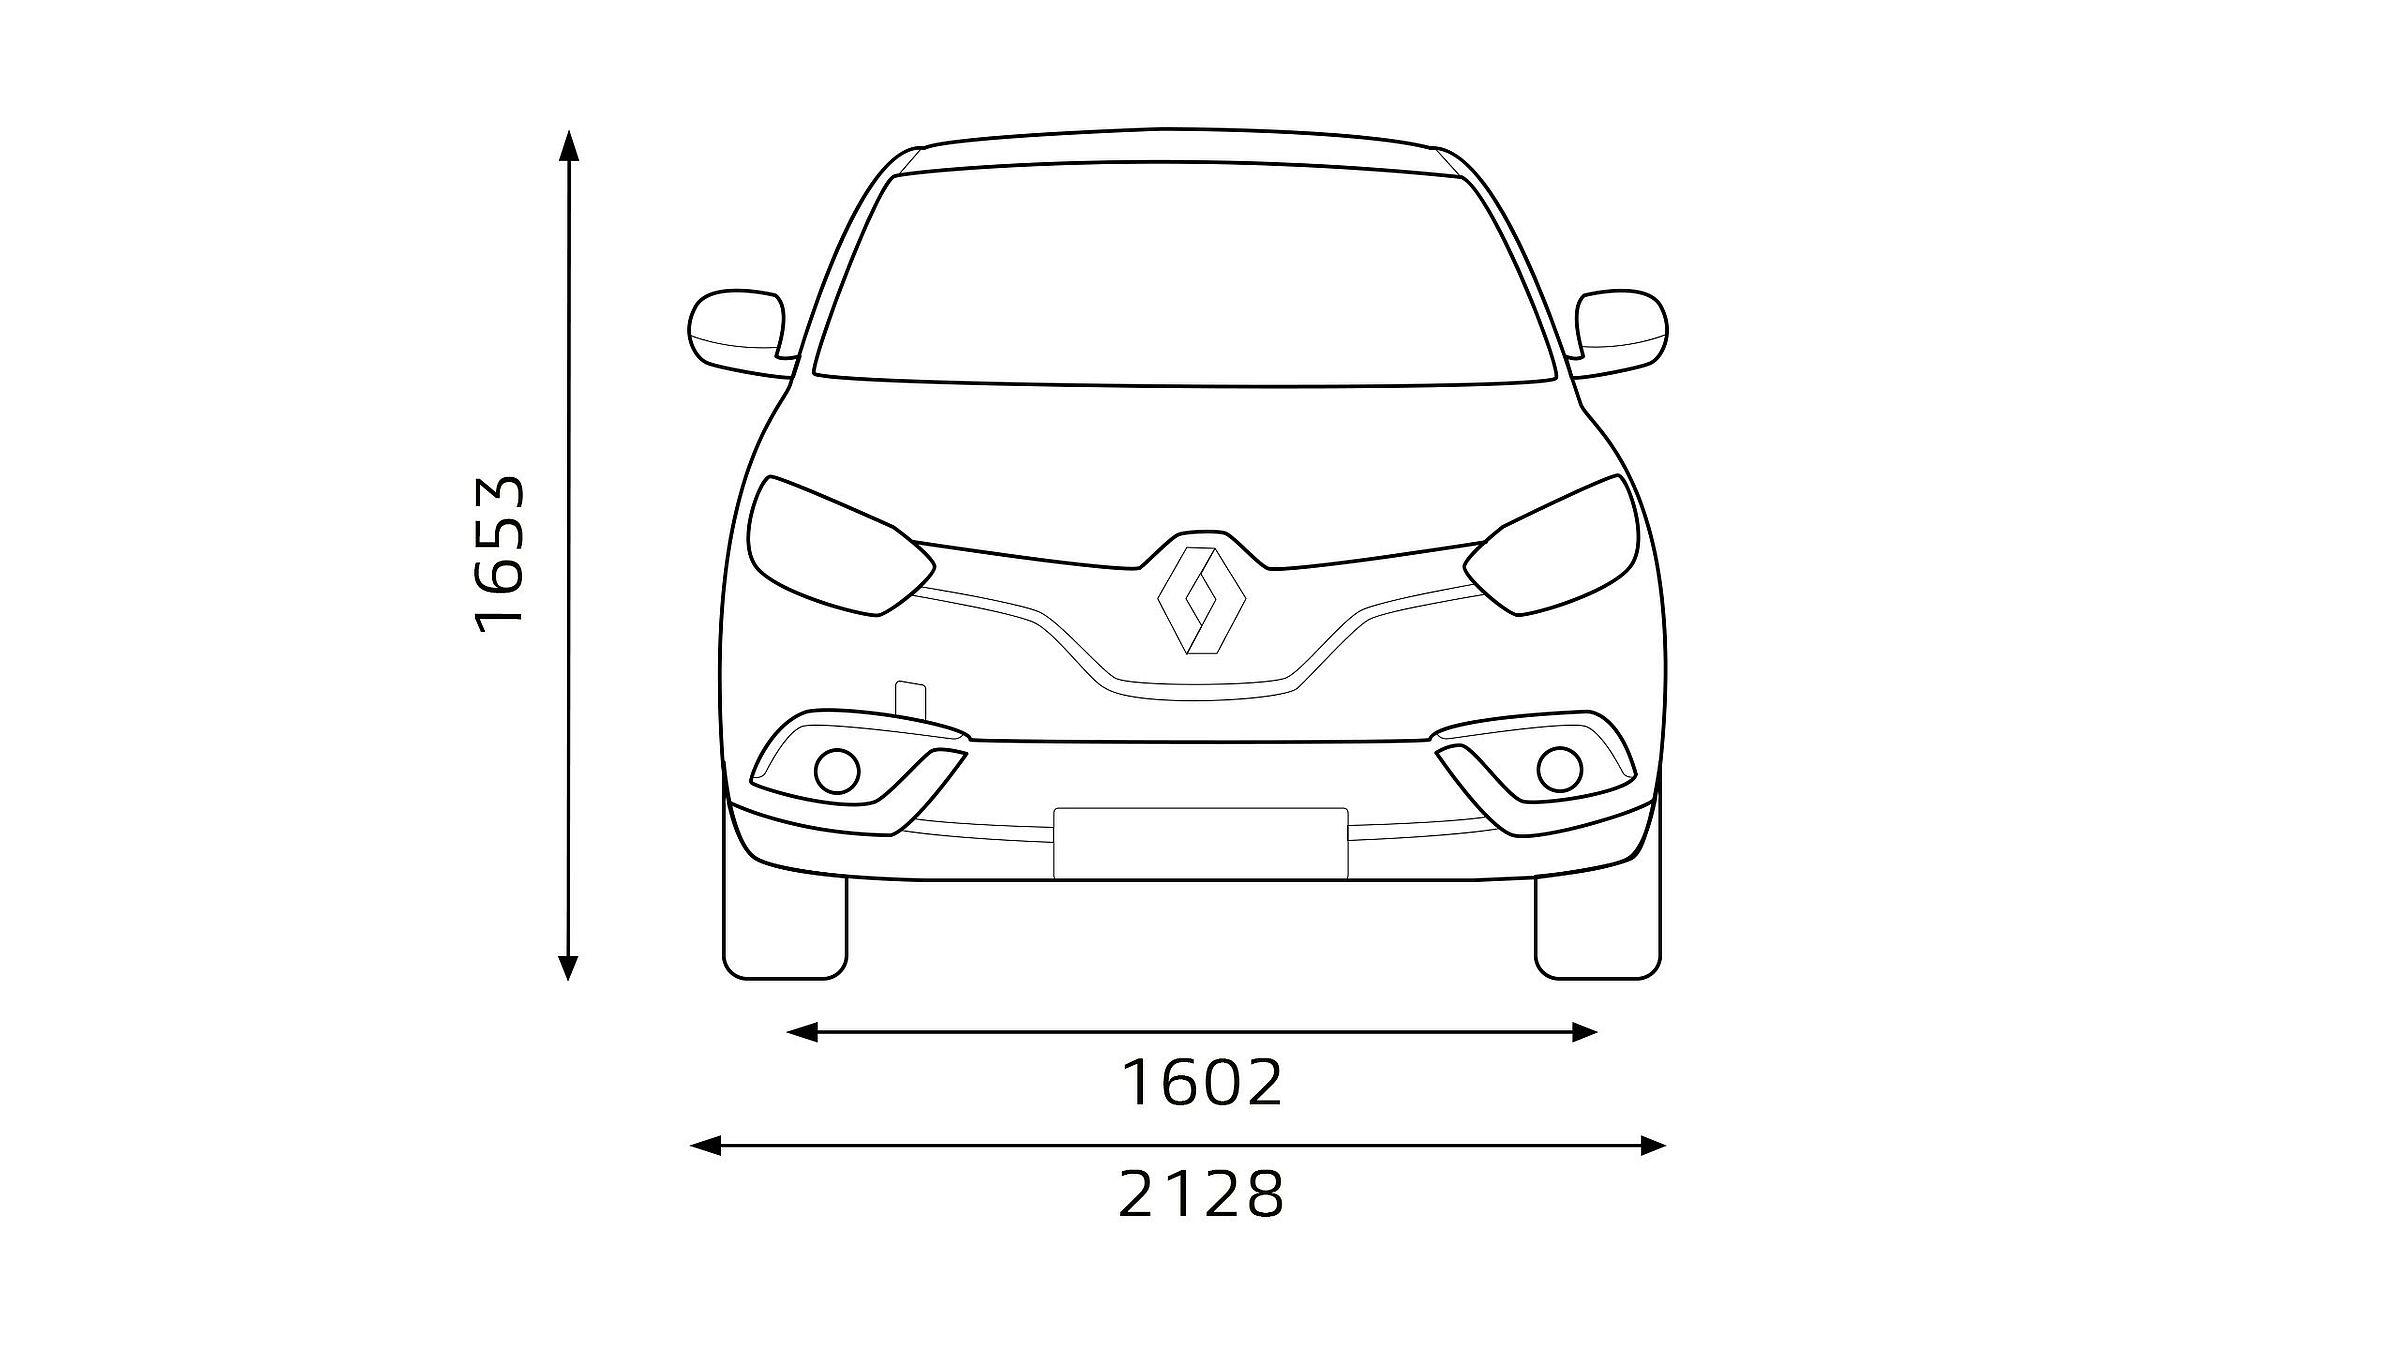 Renault Scenic Autozentren P&A-Preckel